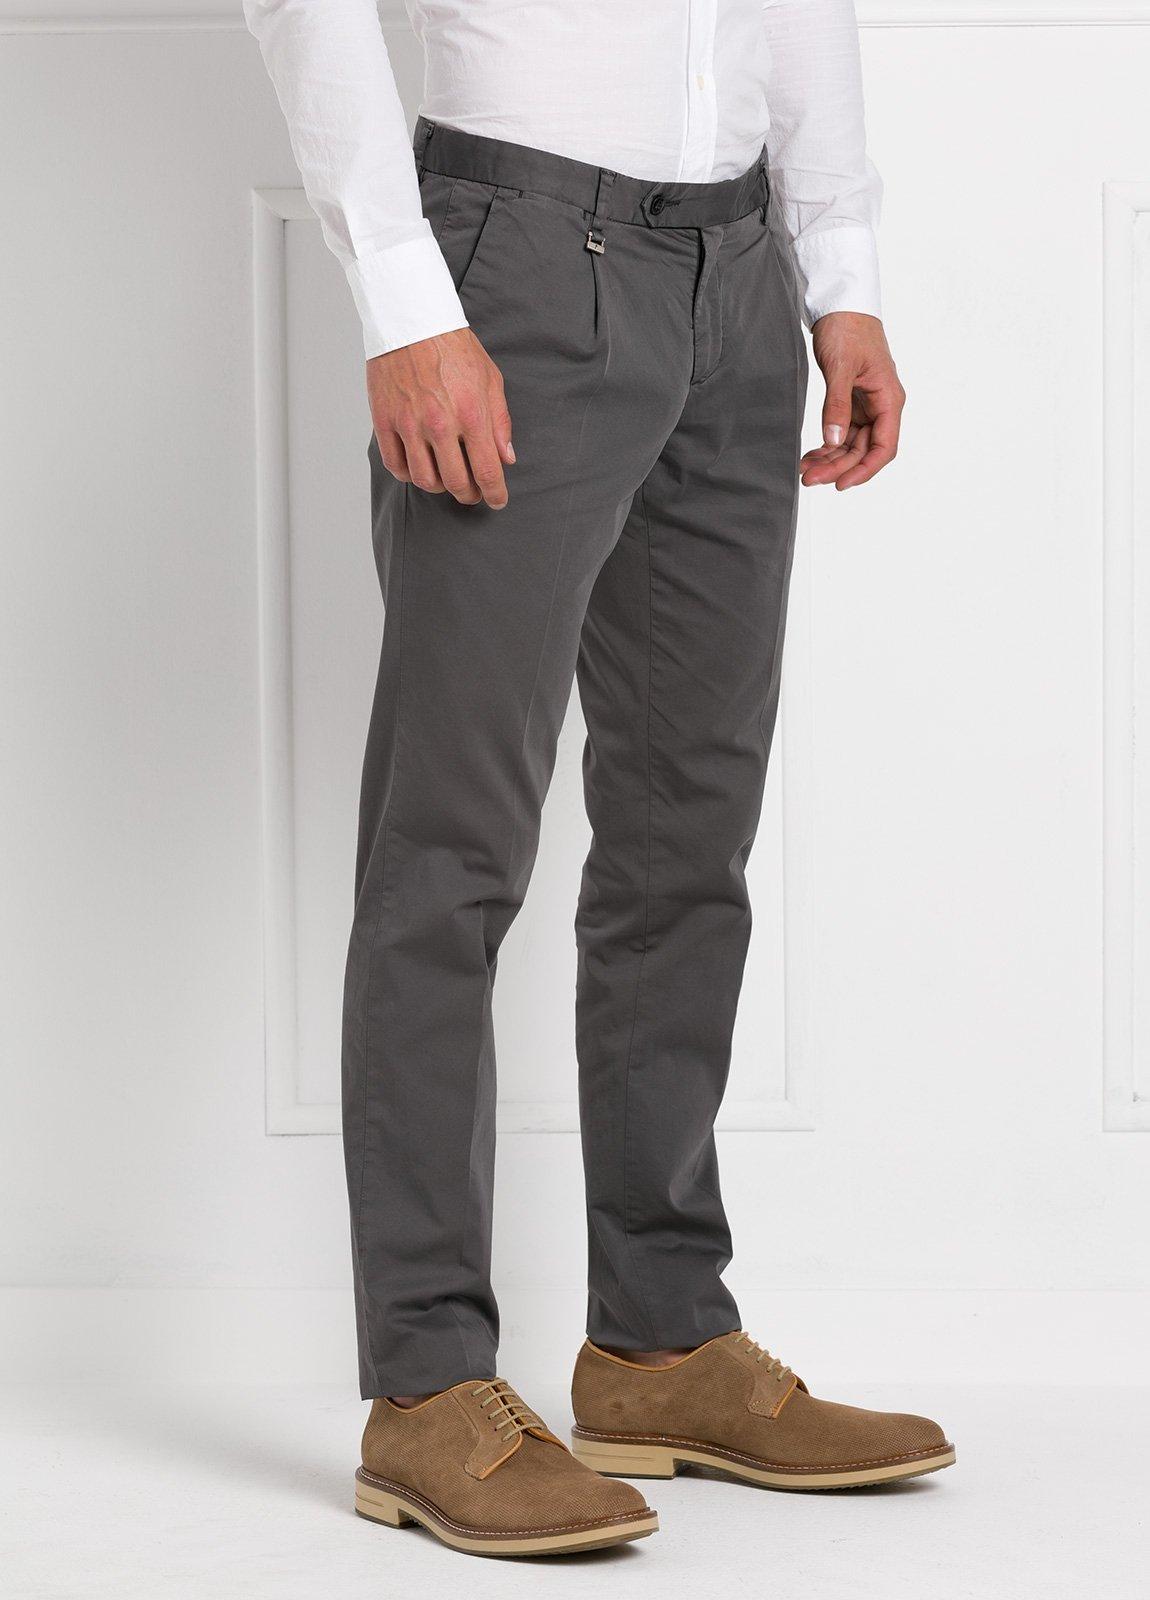 Pantalón modelo slim fit 1 pinza color gris oscuro. 97% Algodón 3% Ea. - Ítem2